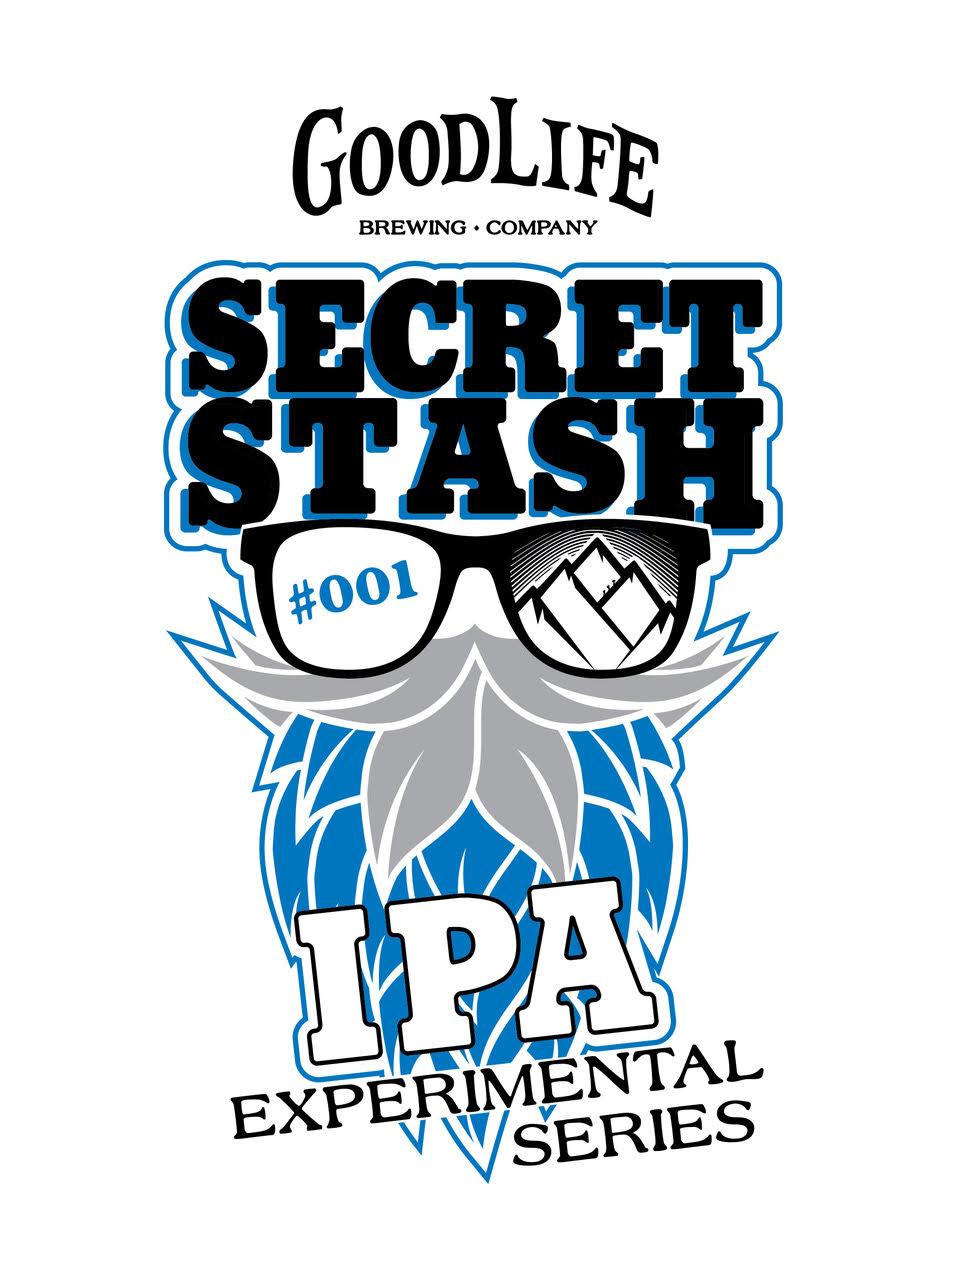 image courtesy GoodLife Brewing Company